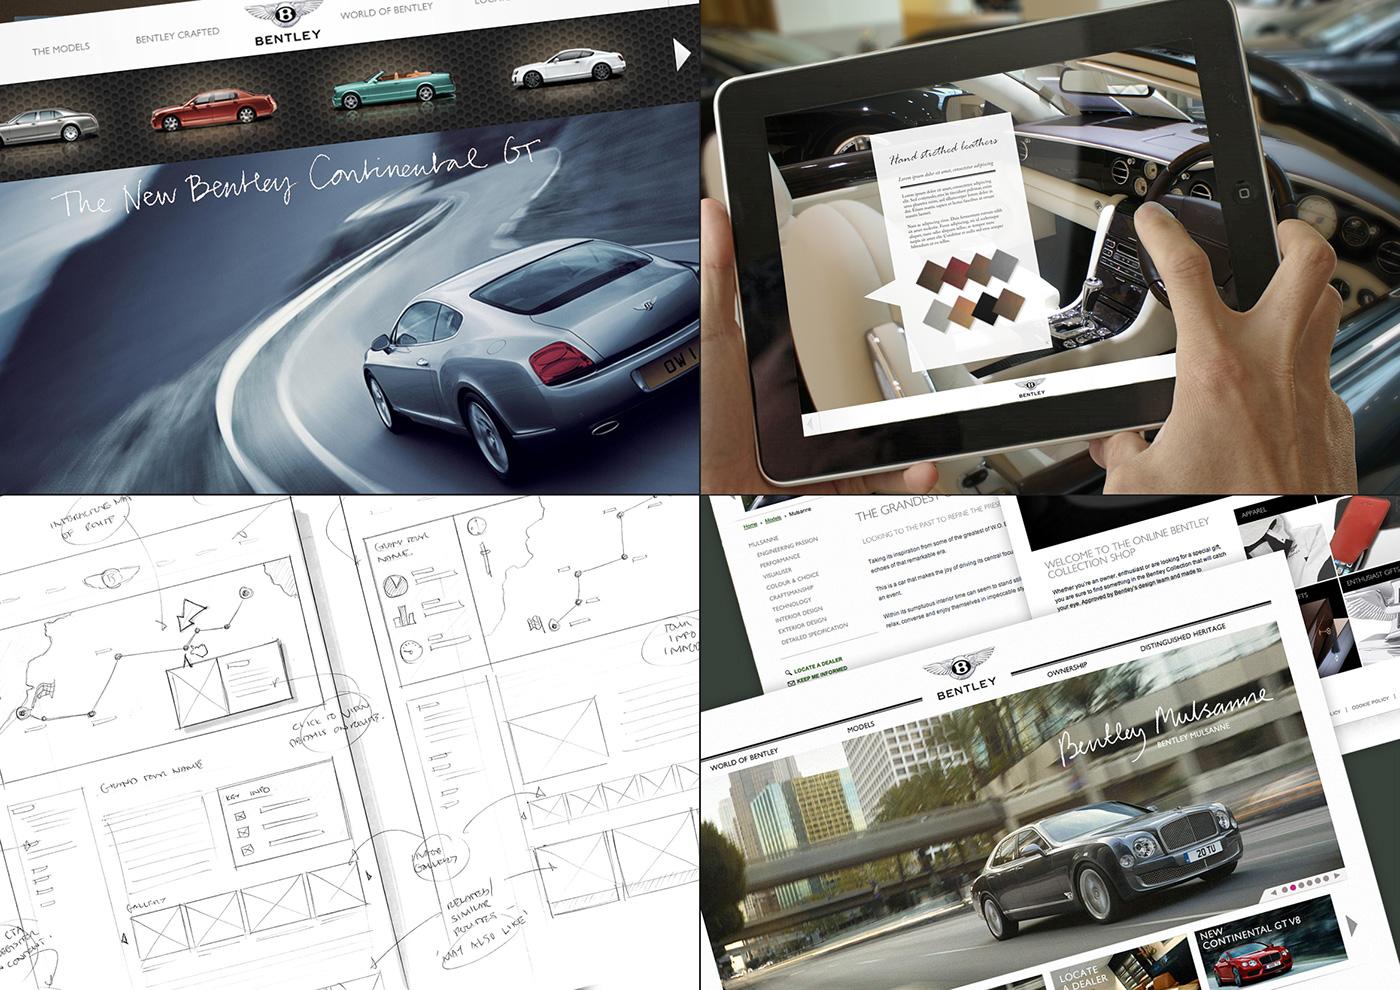 bentley tht Terrence Higgins Trust SKY law law society digital interface design ui design UX design